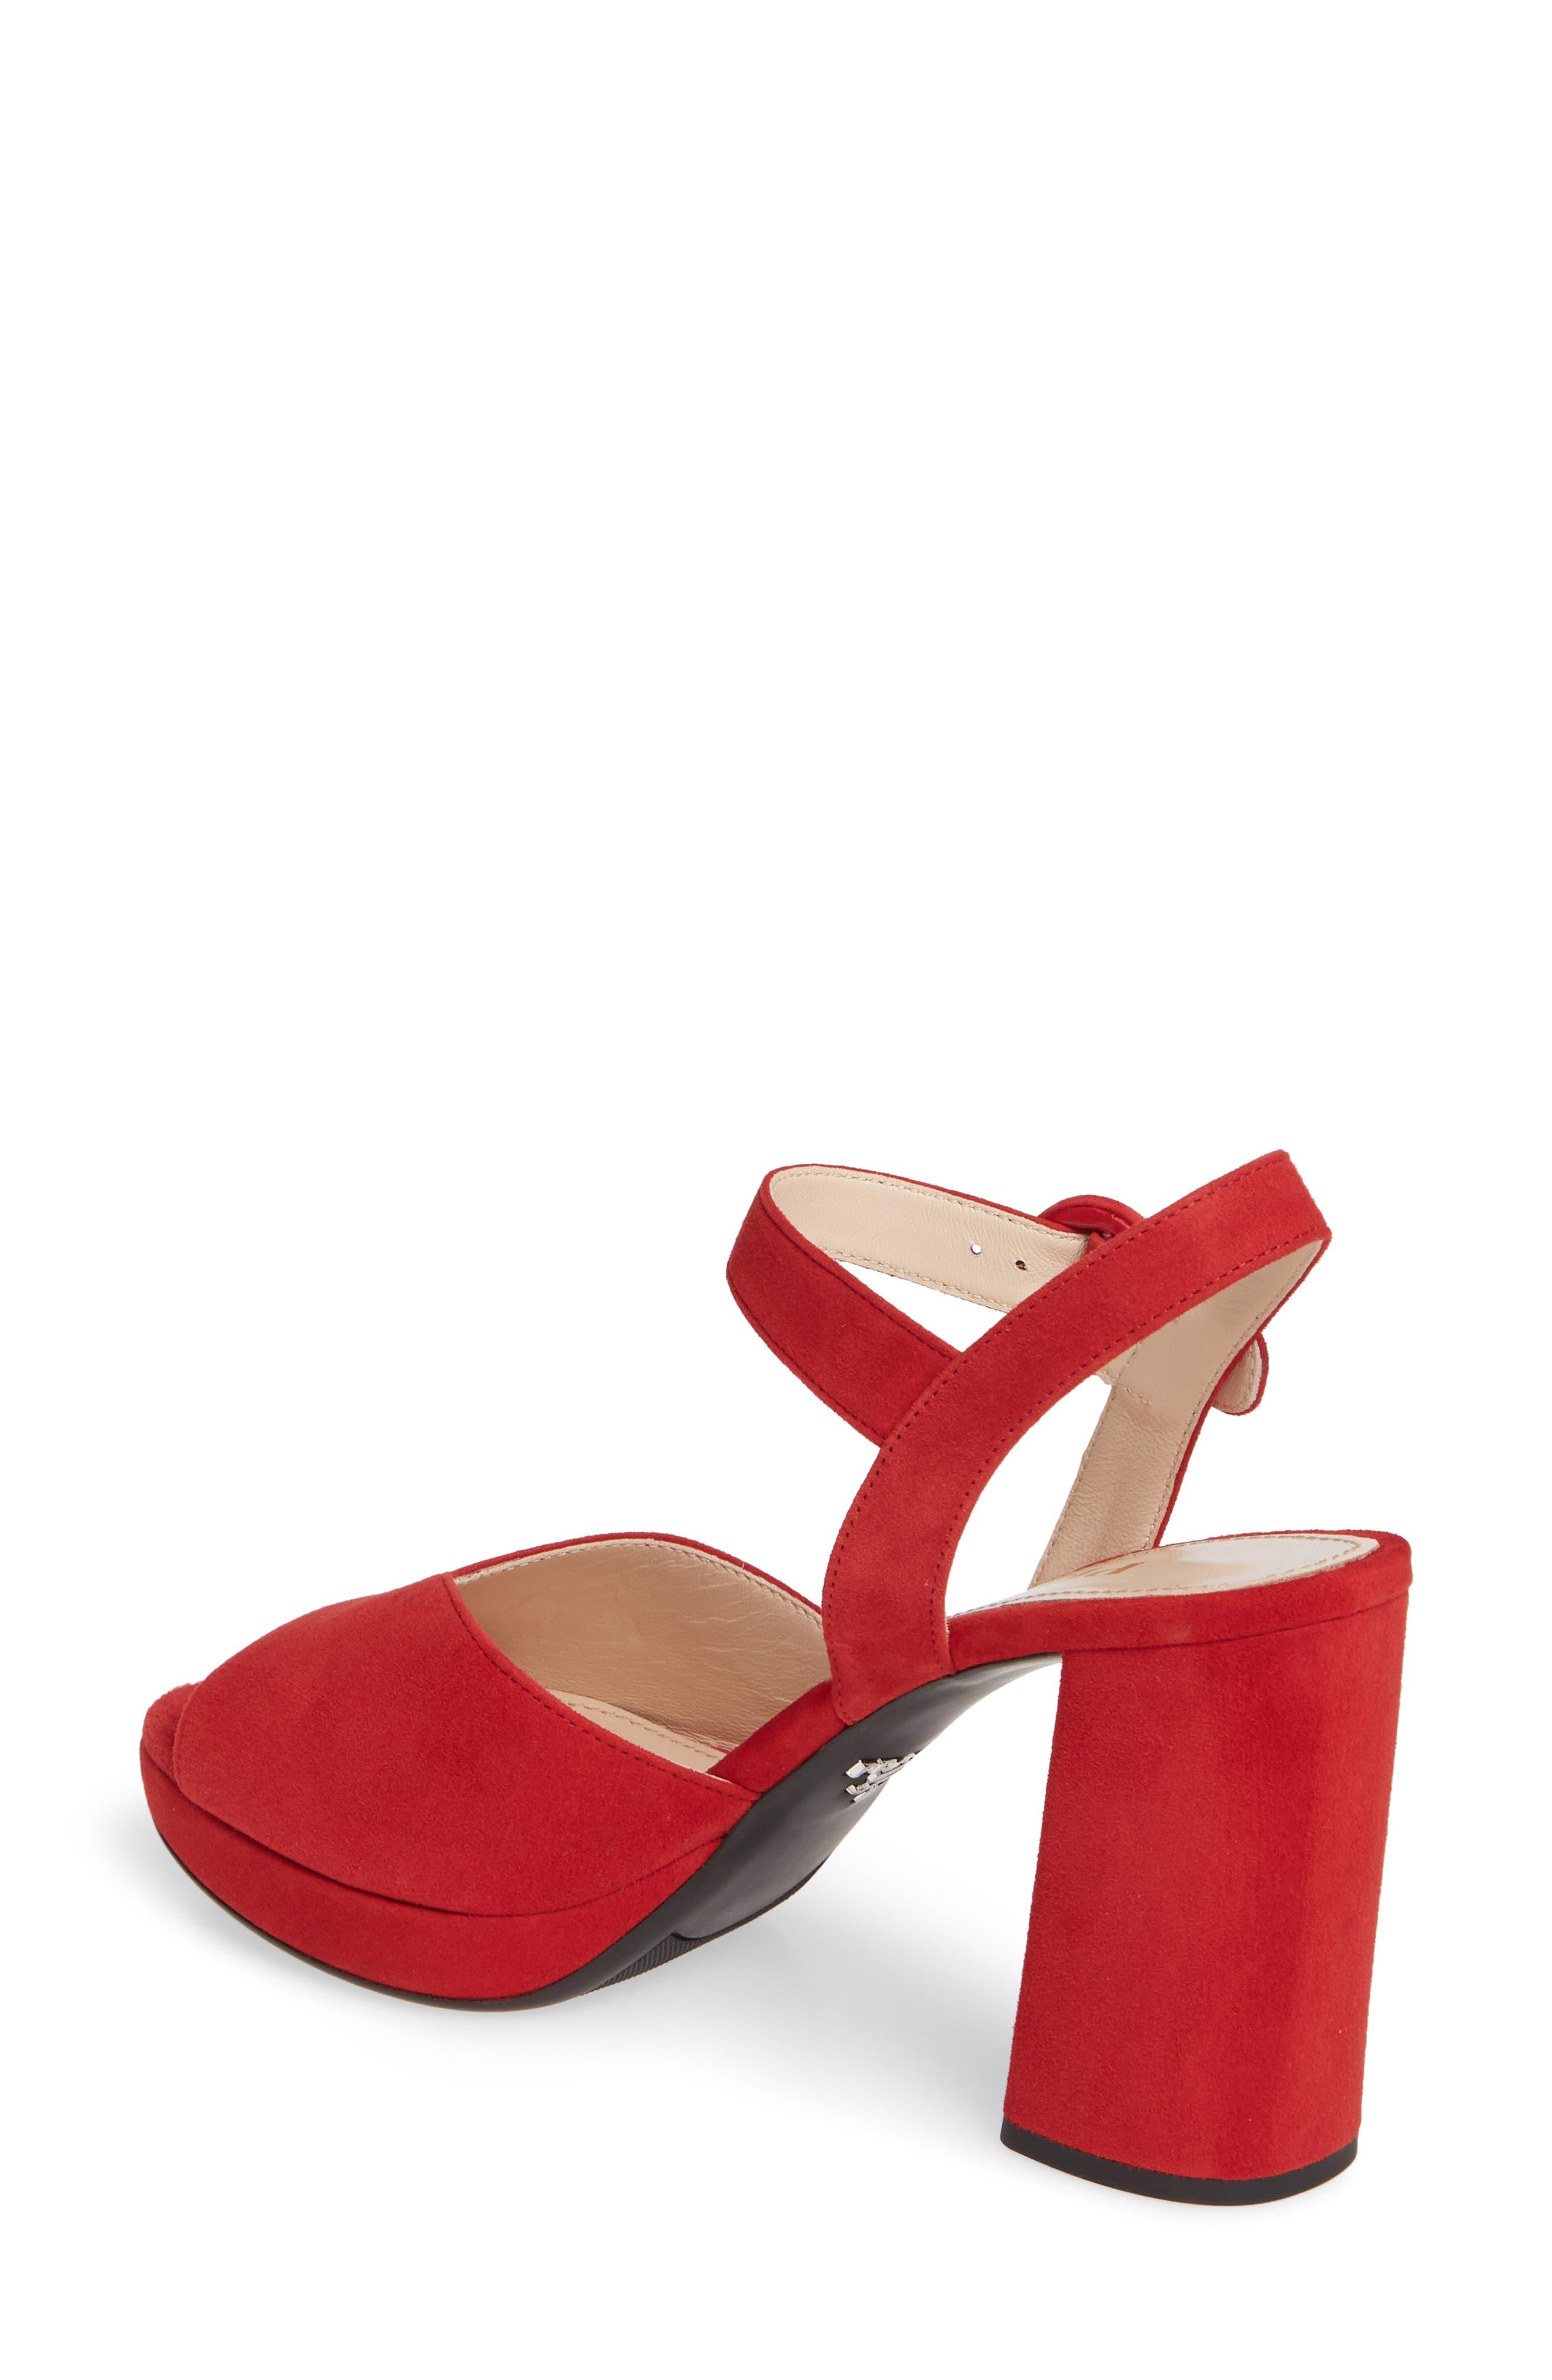 PRADA, Platform Sandal, Alternate thumbnail 2, color, RED SUEDE